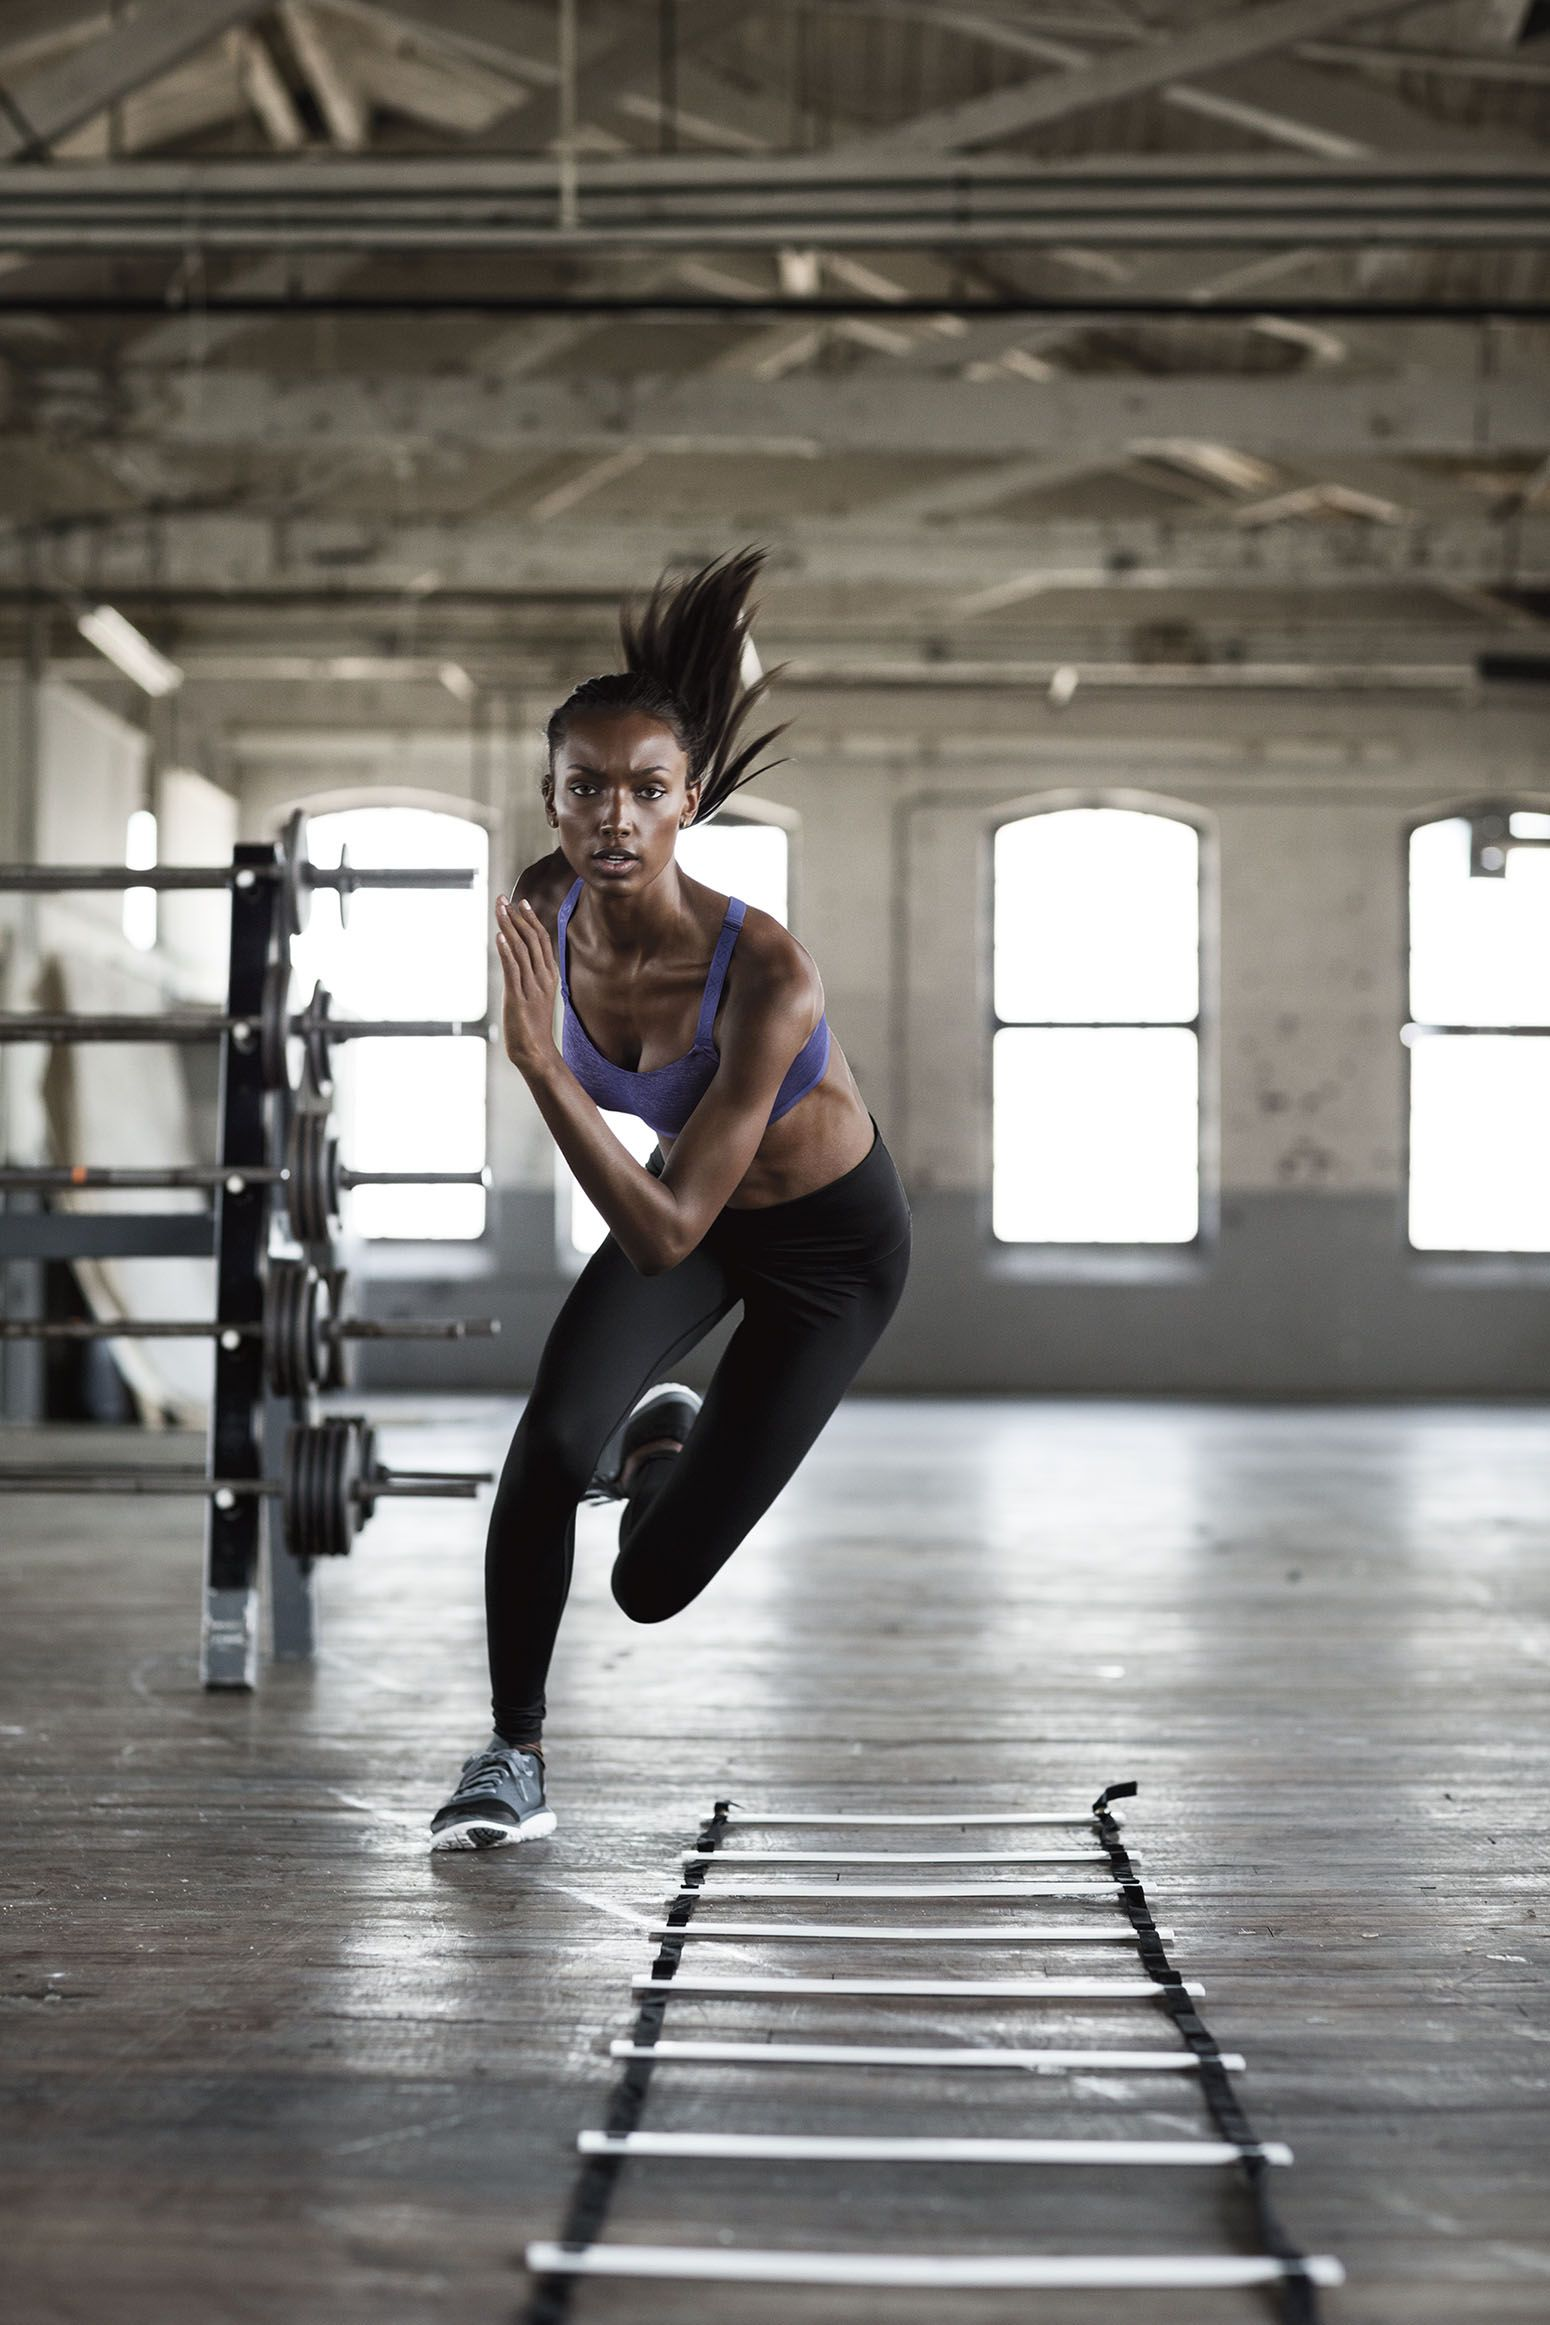 Fancy Footwork Maximum Support How To Kick Your Fitness Game To The Next Level The Ultimate By Vict Fitnes Vdohnovenie Fizkulturnye Uprazhneniya Krossfit